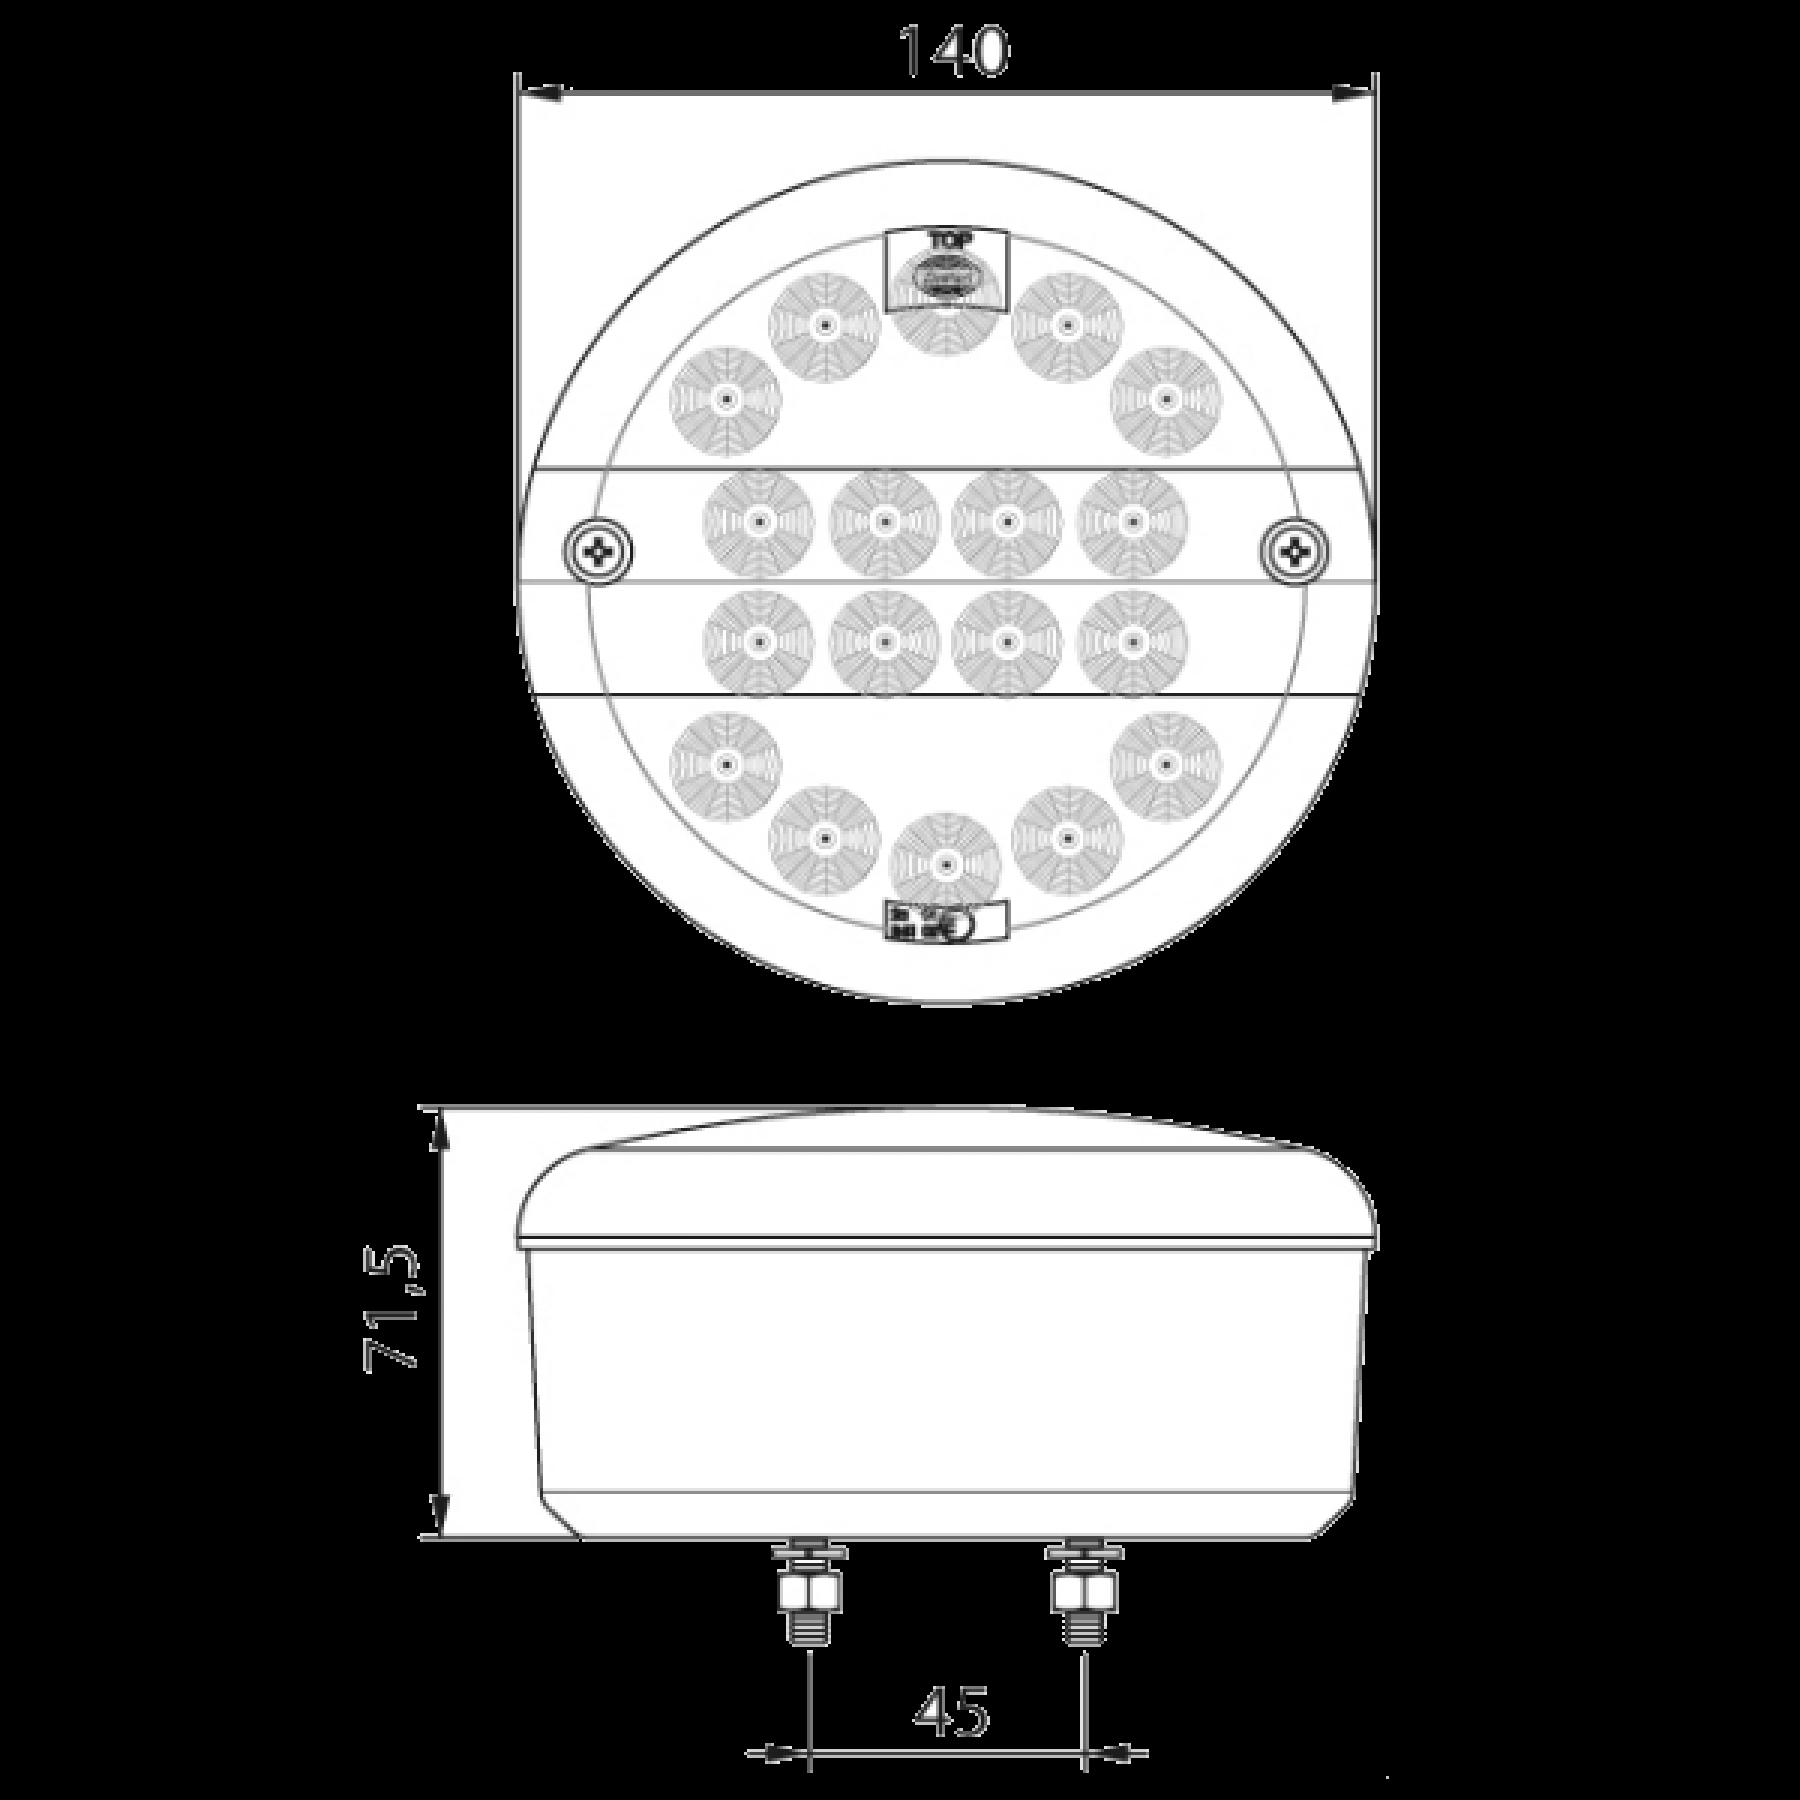 Achterlicht LED rond Ø 140 mm 12/24v (blank glas)